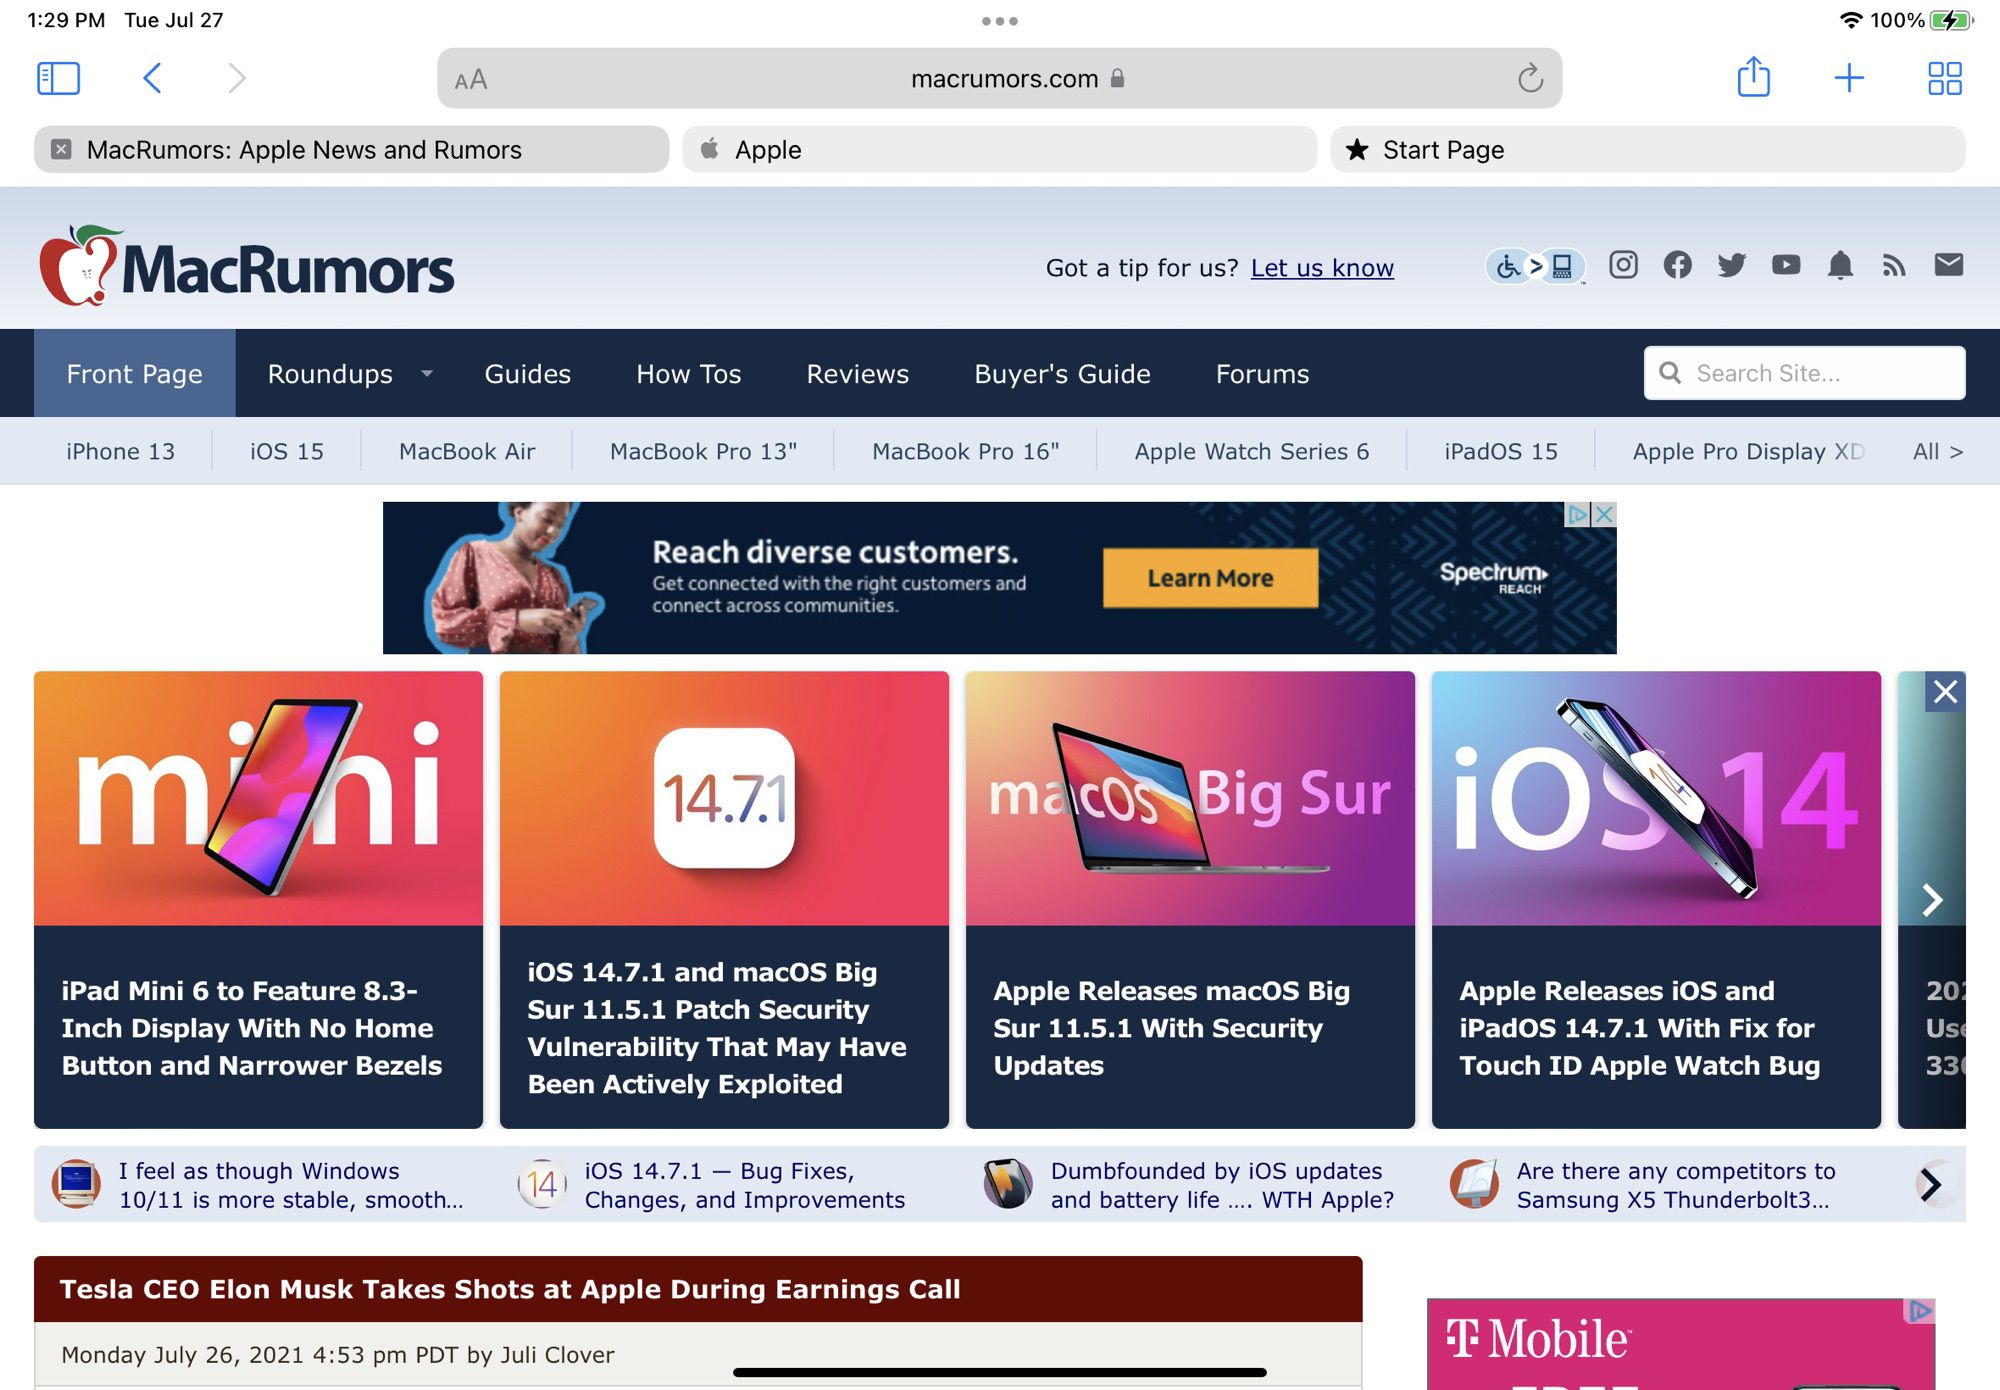 iPadOS 15 Gains macOS Monterey's Redesigned Safari Tab Interface